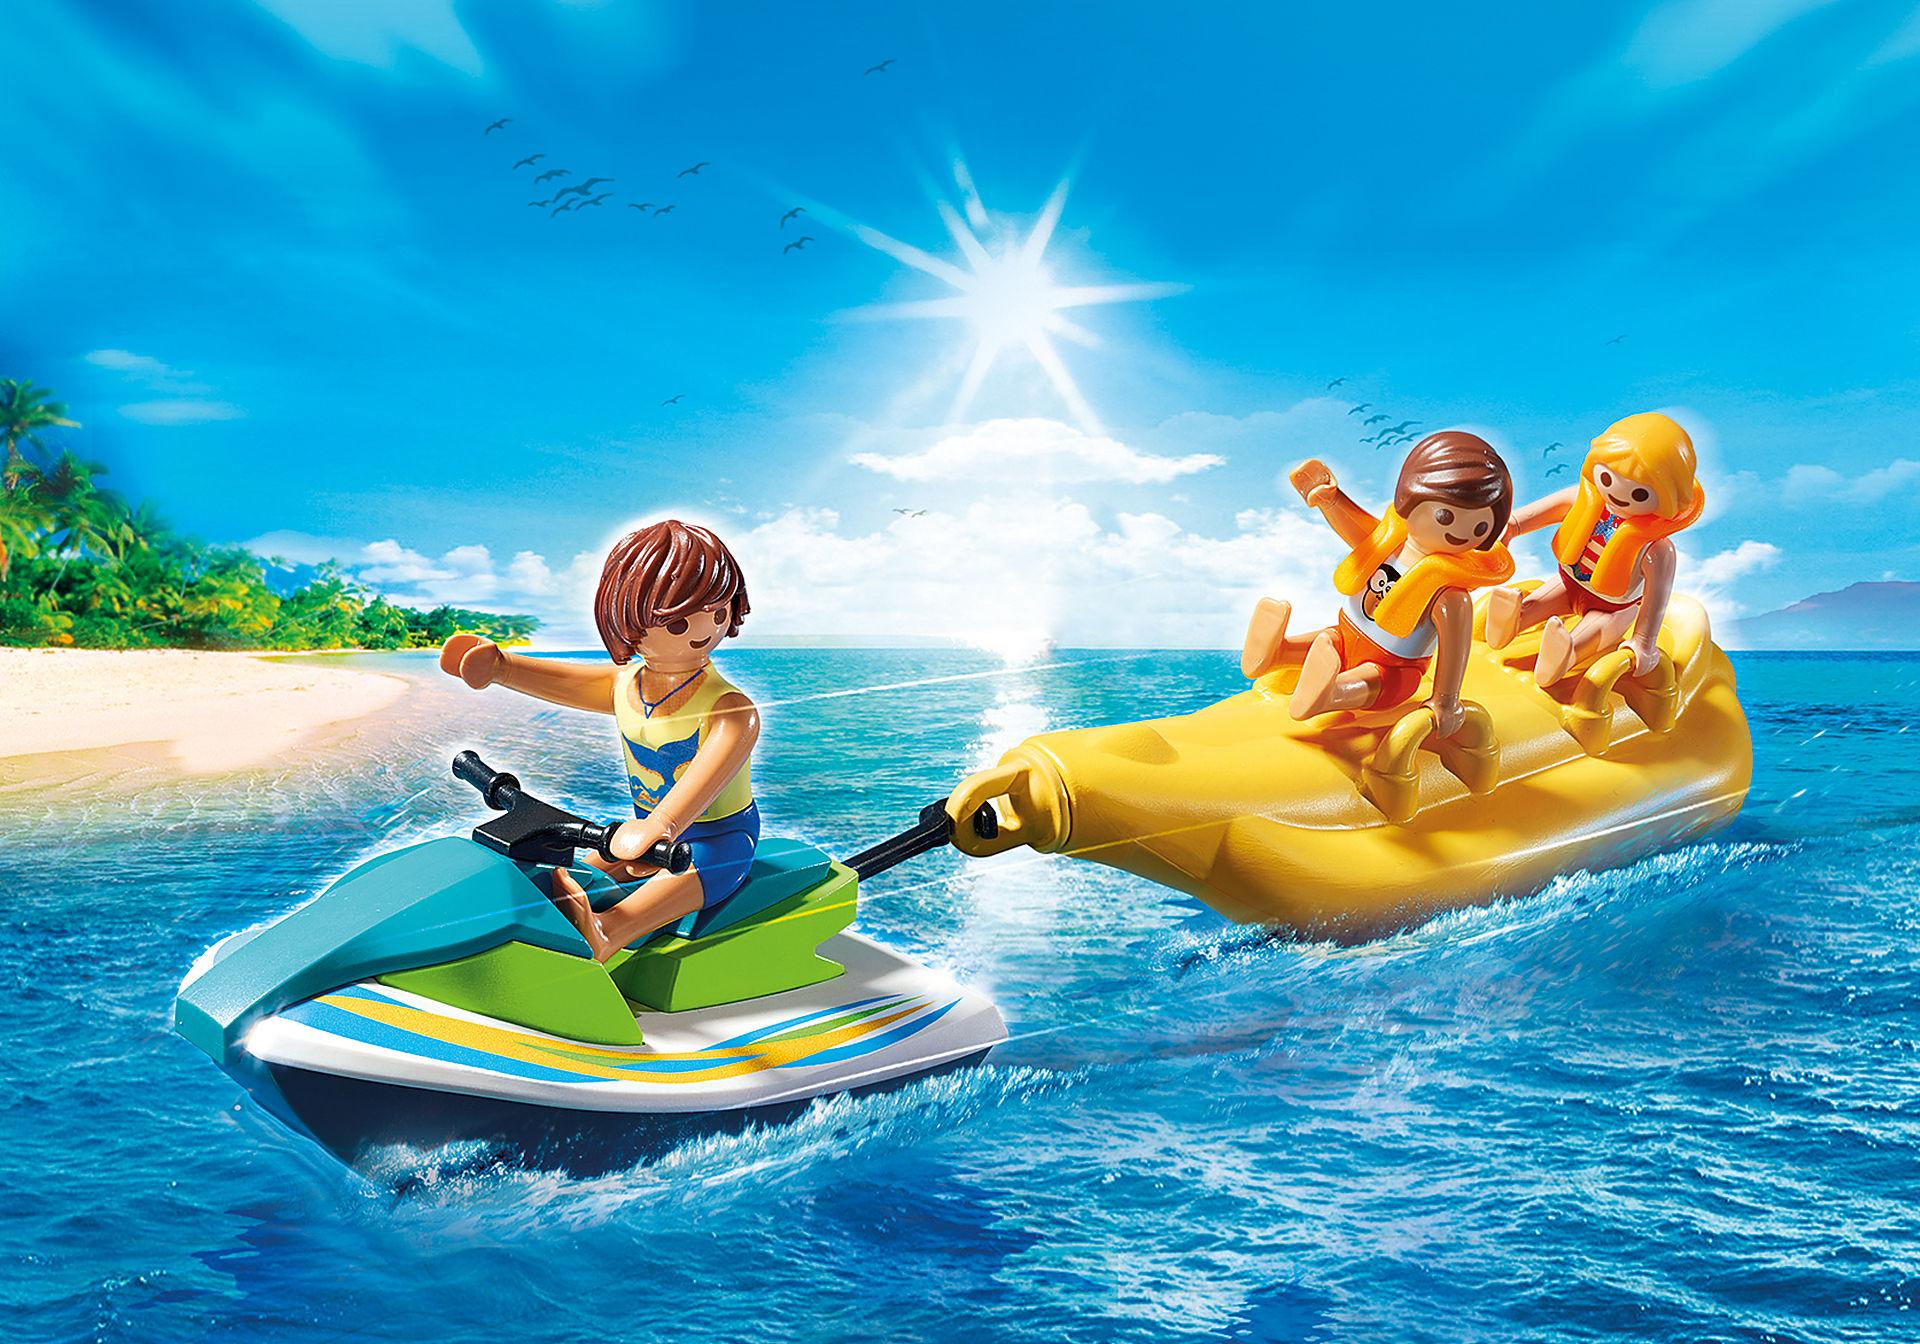 http://media.playmobil.com/i/playmobil/9163_product_detail/Island Banana Boat Ride